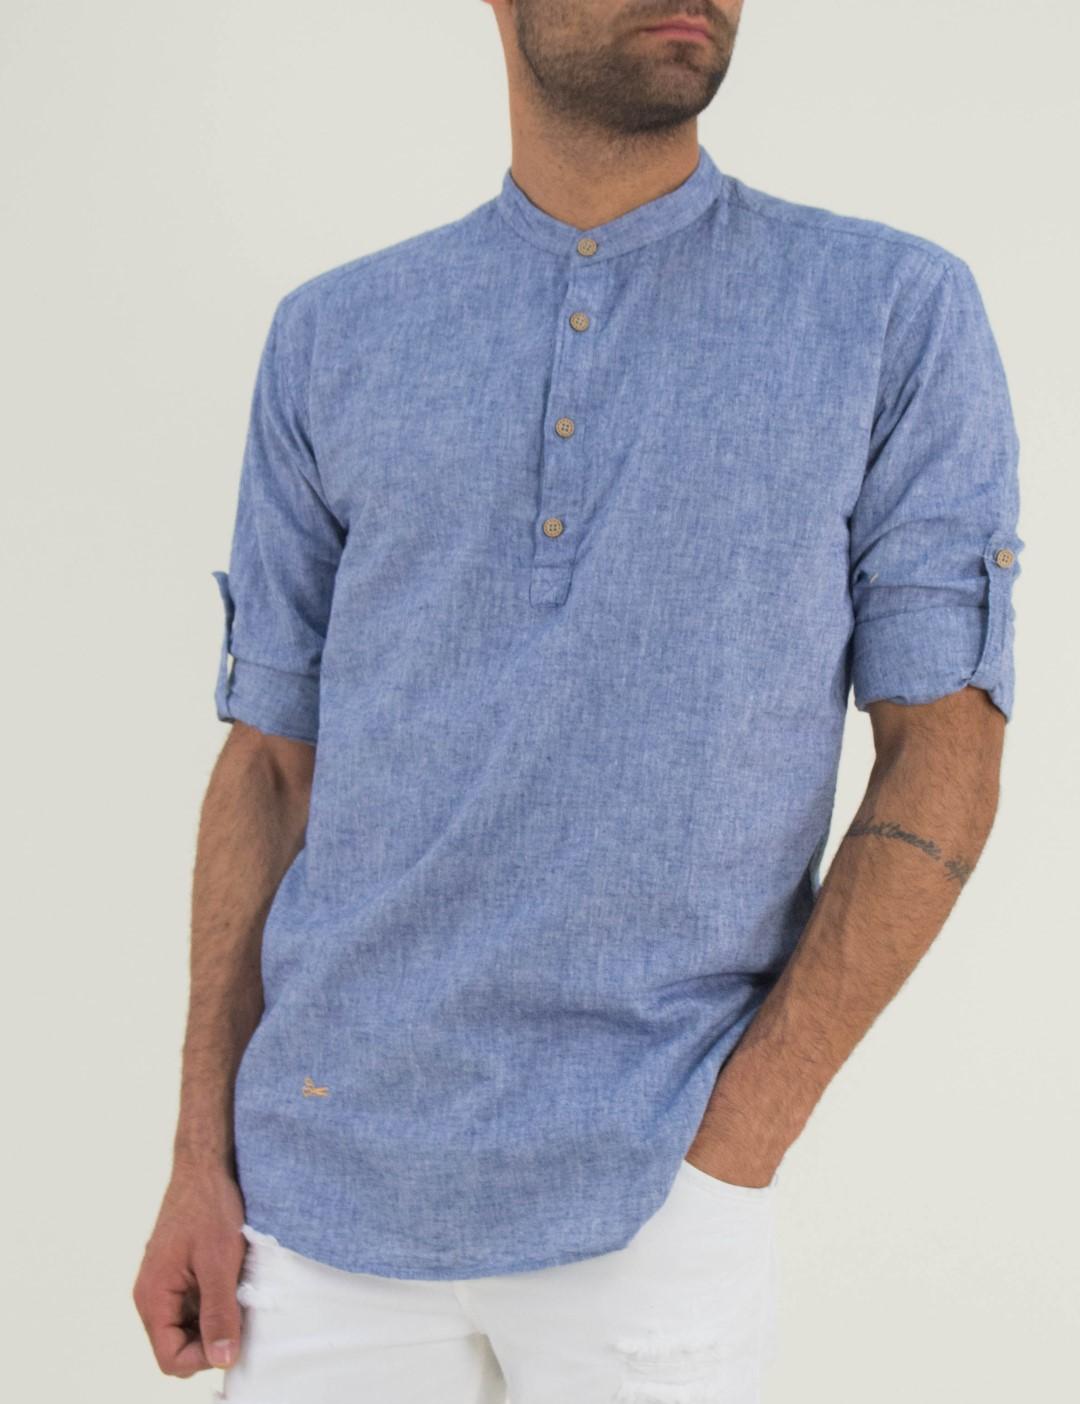 4eeece594182 Ανδρικό μπλέ πουκάμισο Ben Tailor μαο γιακά 1128D